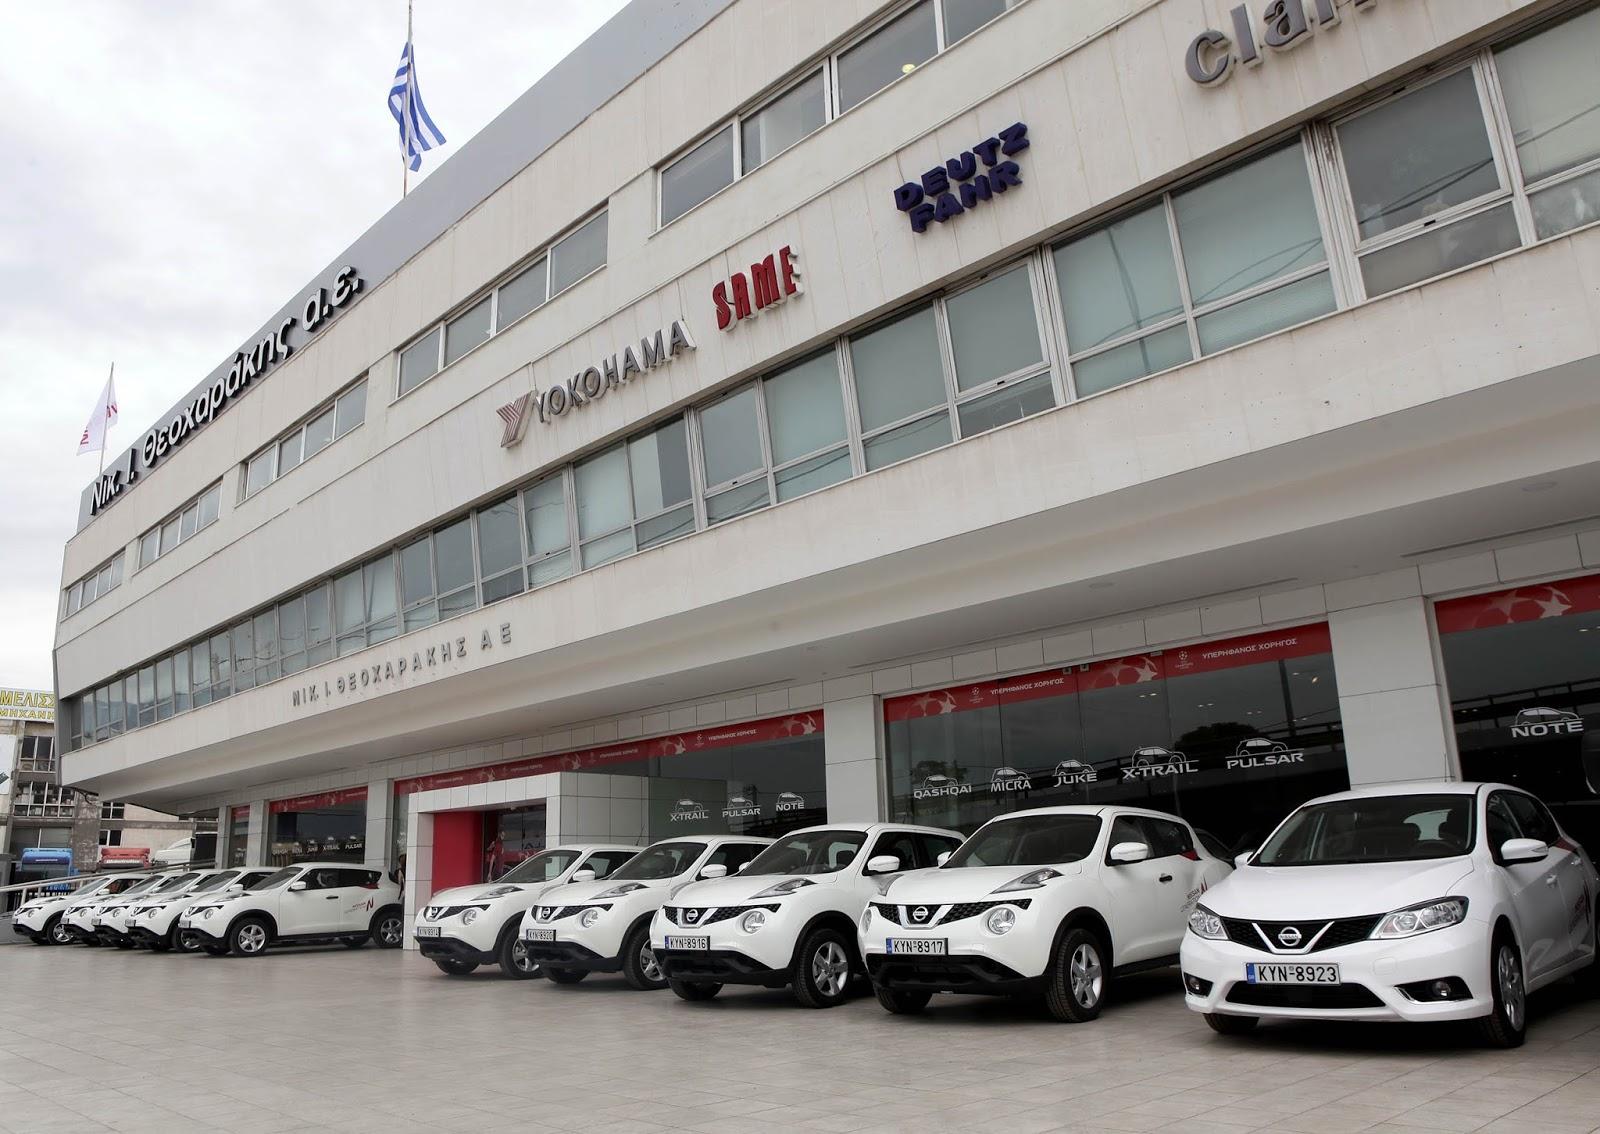 IMG 5879 Η Nissan βραβεύει με αυτοκίνητα του νικητές του GENERATION N ! Events, Future, Innovation, Nissan